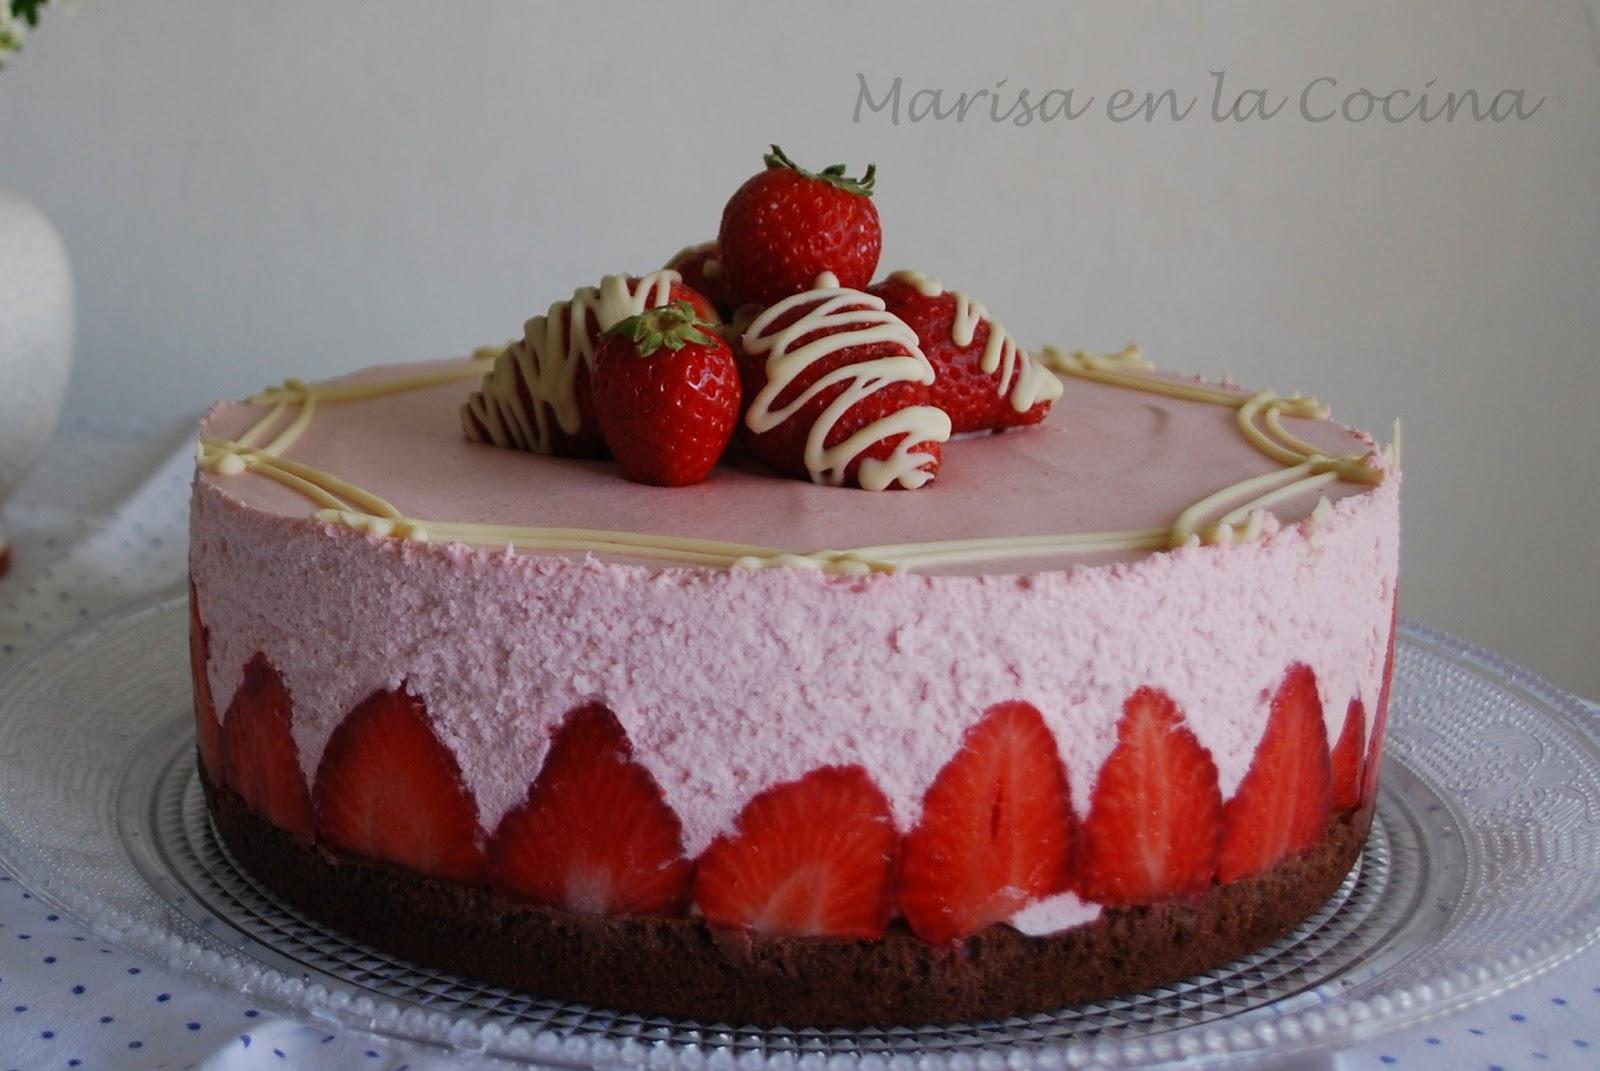 Marisa en la Cocina: Tarta Mouse de Fresas